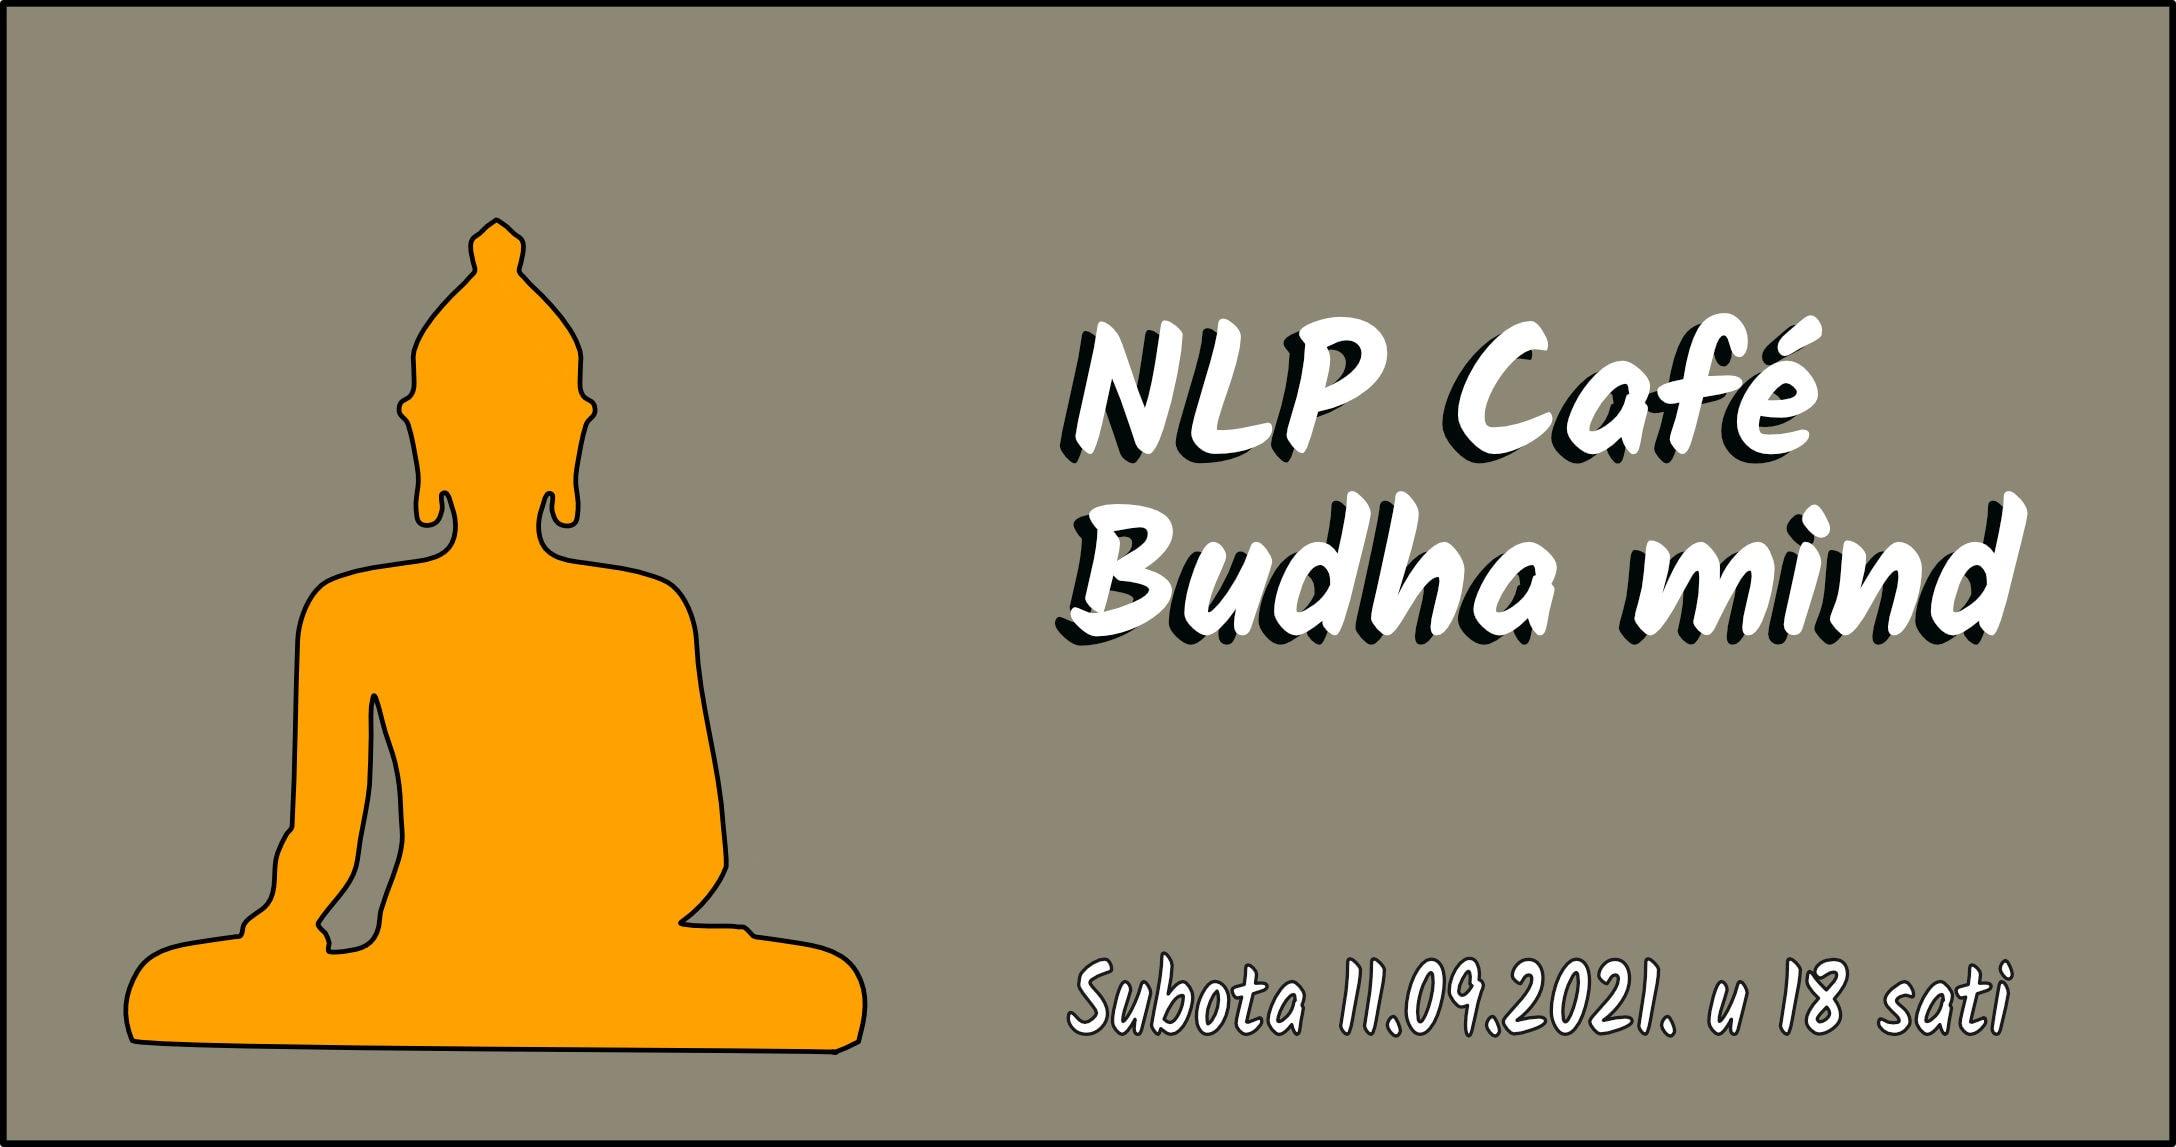 NLP Cafe Budha mind